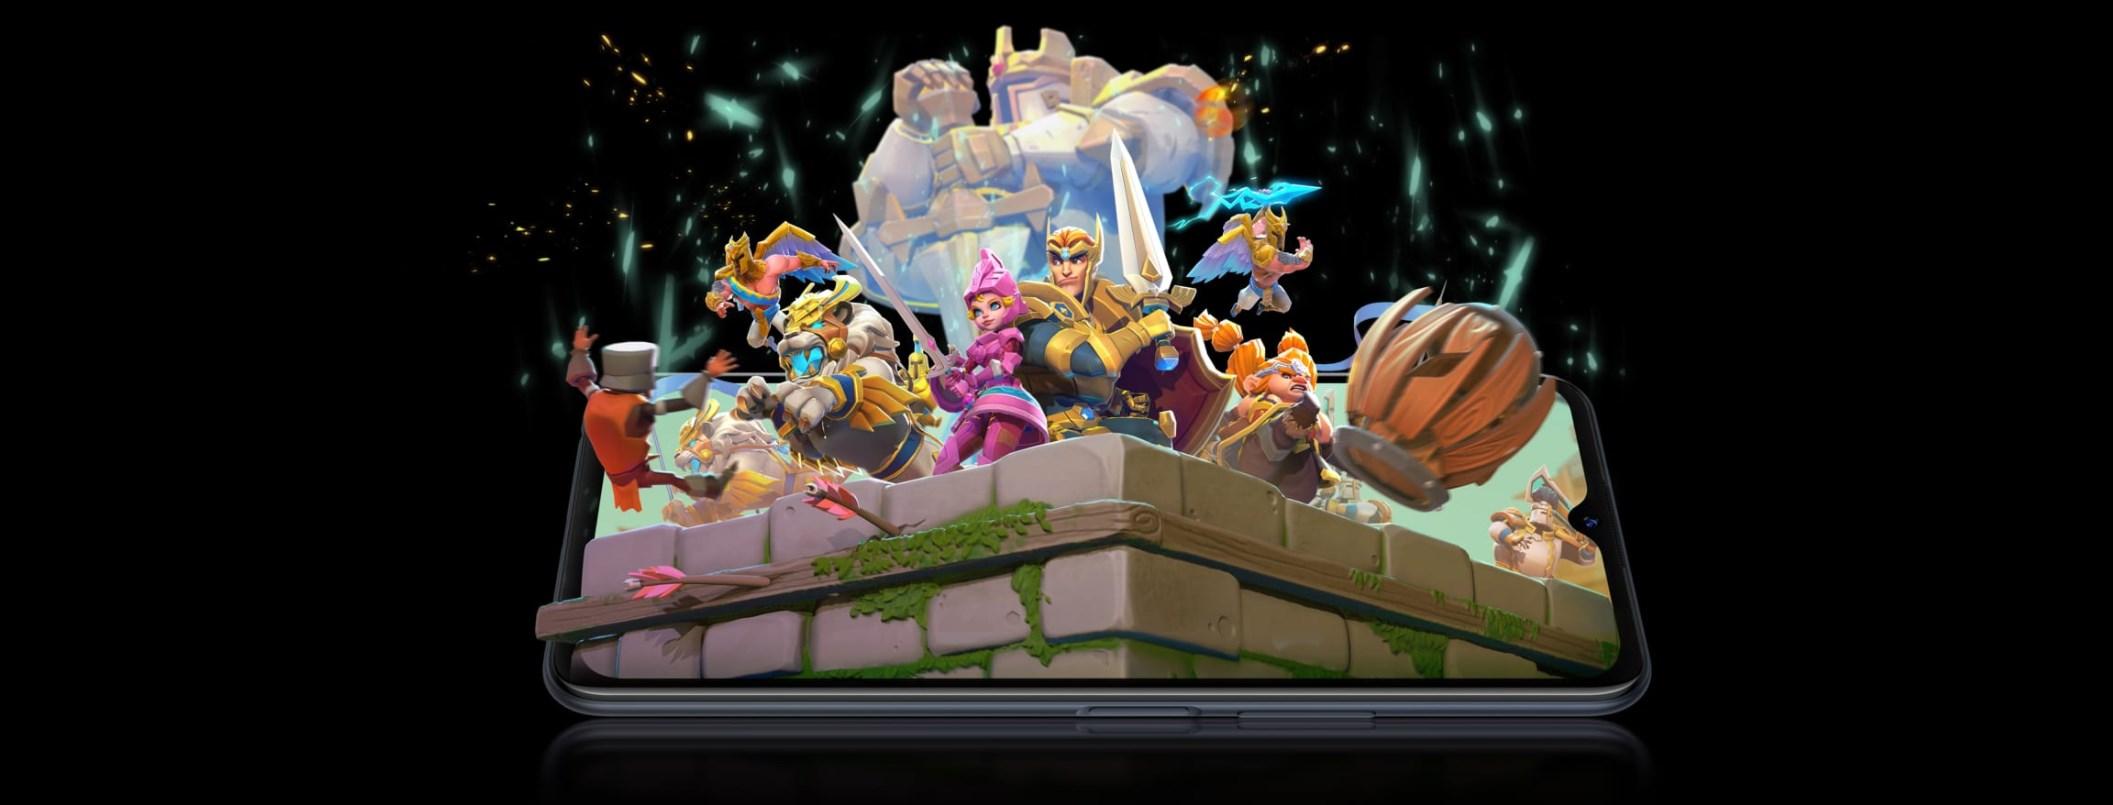 vivo y20s lords mobile multi turbo 3.0